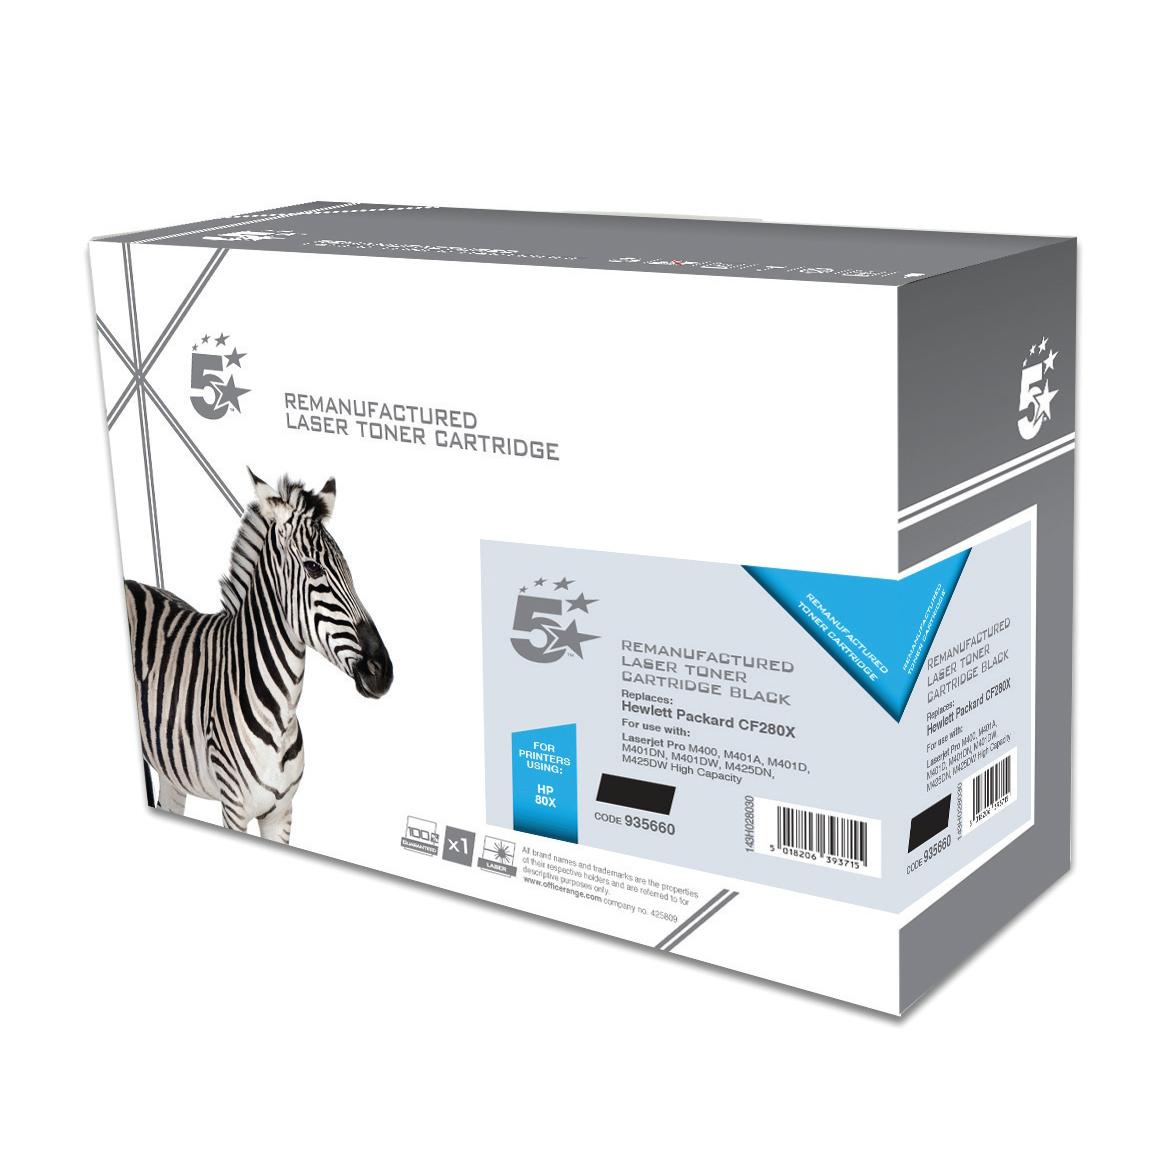 5 Star Office Remanufactured Laser Toner Cartridge Page Life 6900pp Black [HP No. 80X CF280X Alternative]